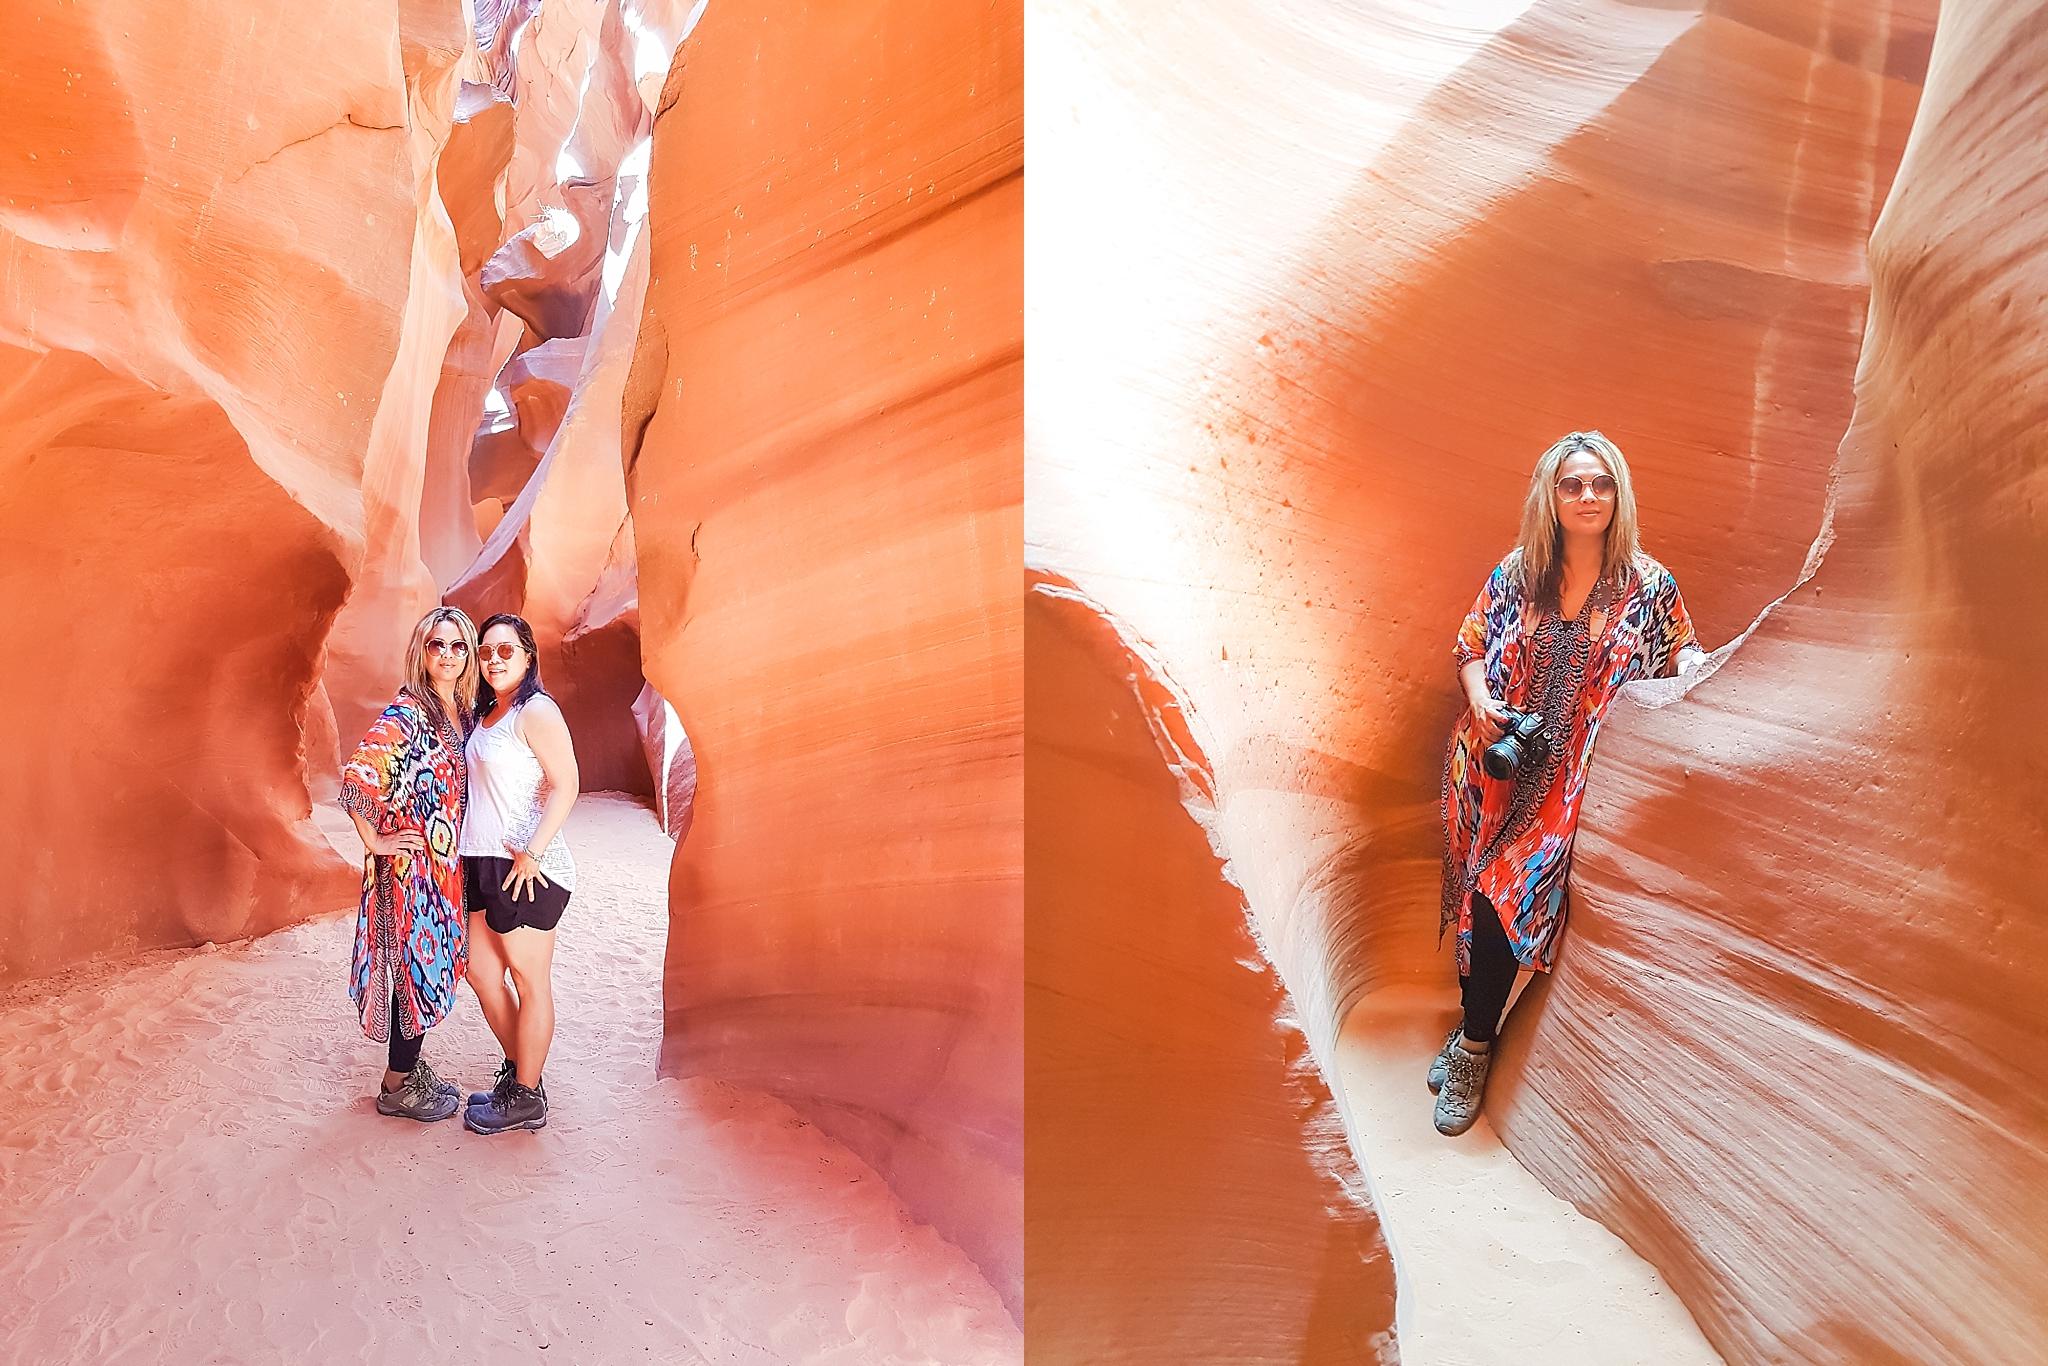 Jade and Darlynne inside the Lower Antelope Canyon near Page, Arizona.